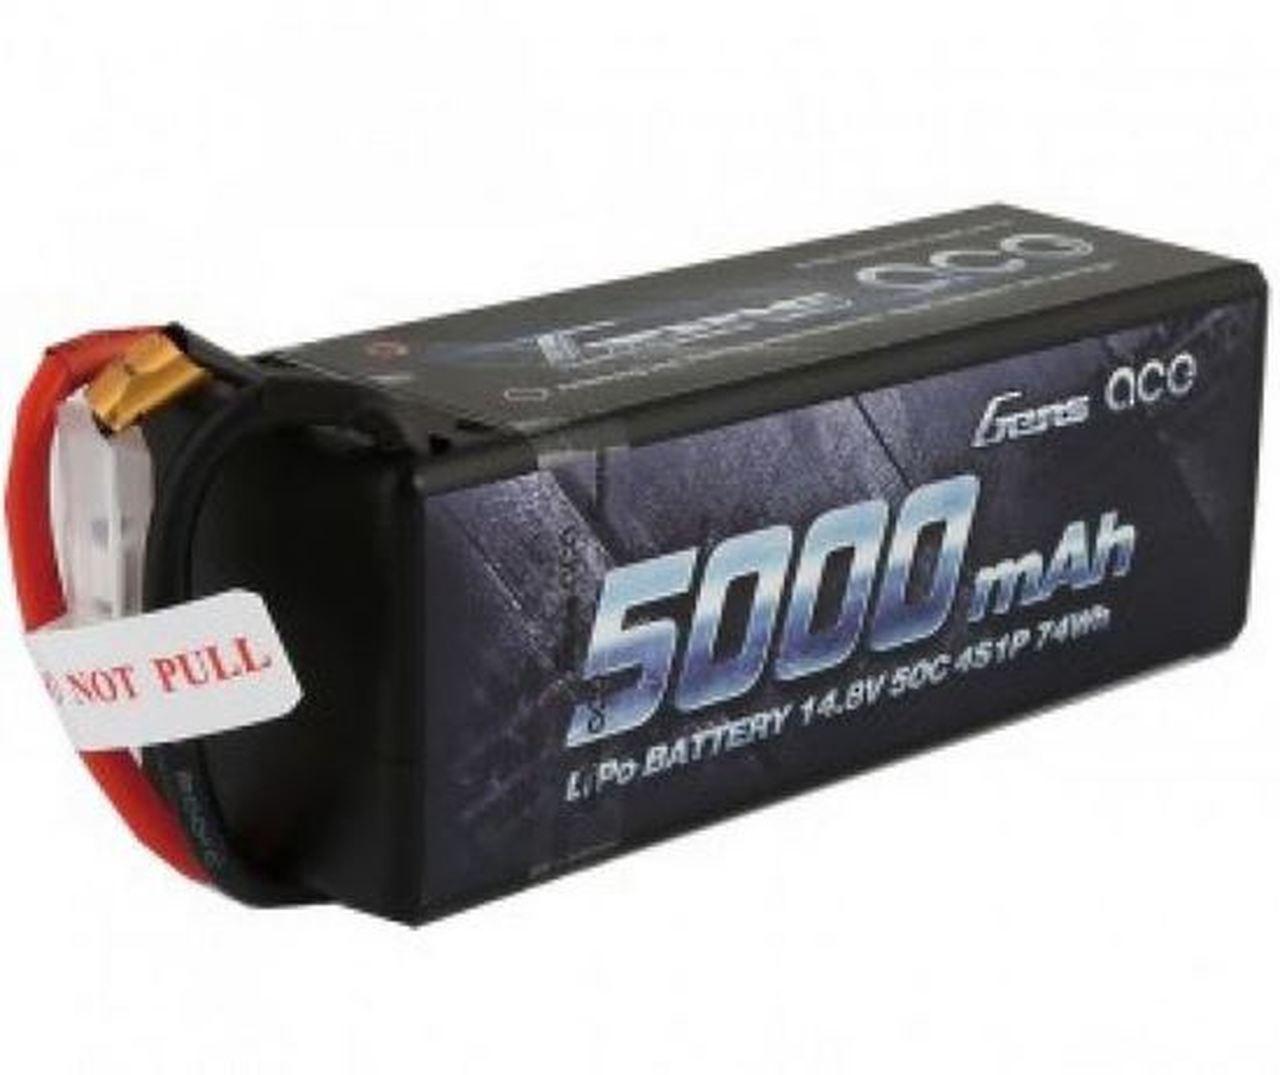 Gens-Ace #5000mah 4S 50C EC5 Plug Hard Case